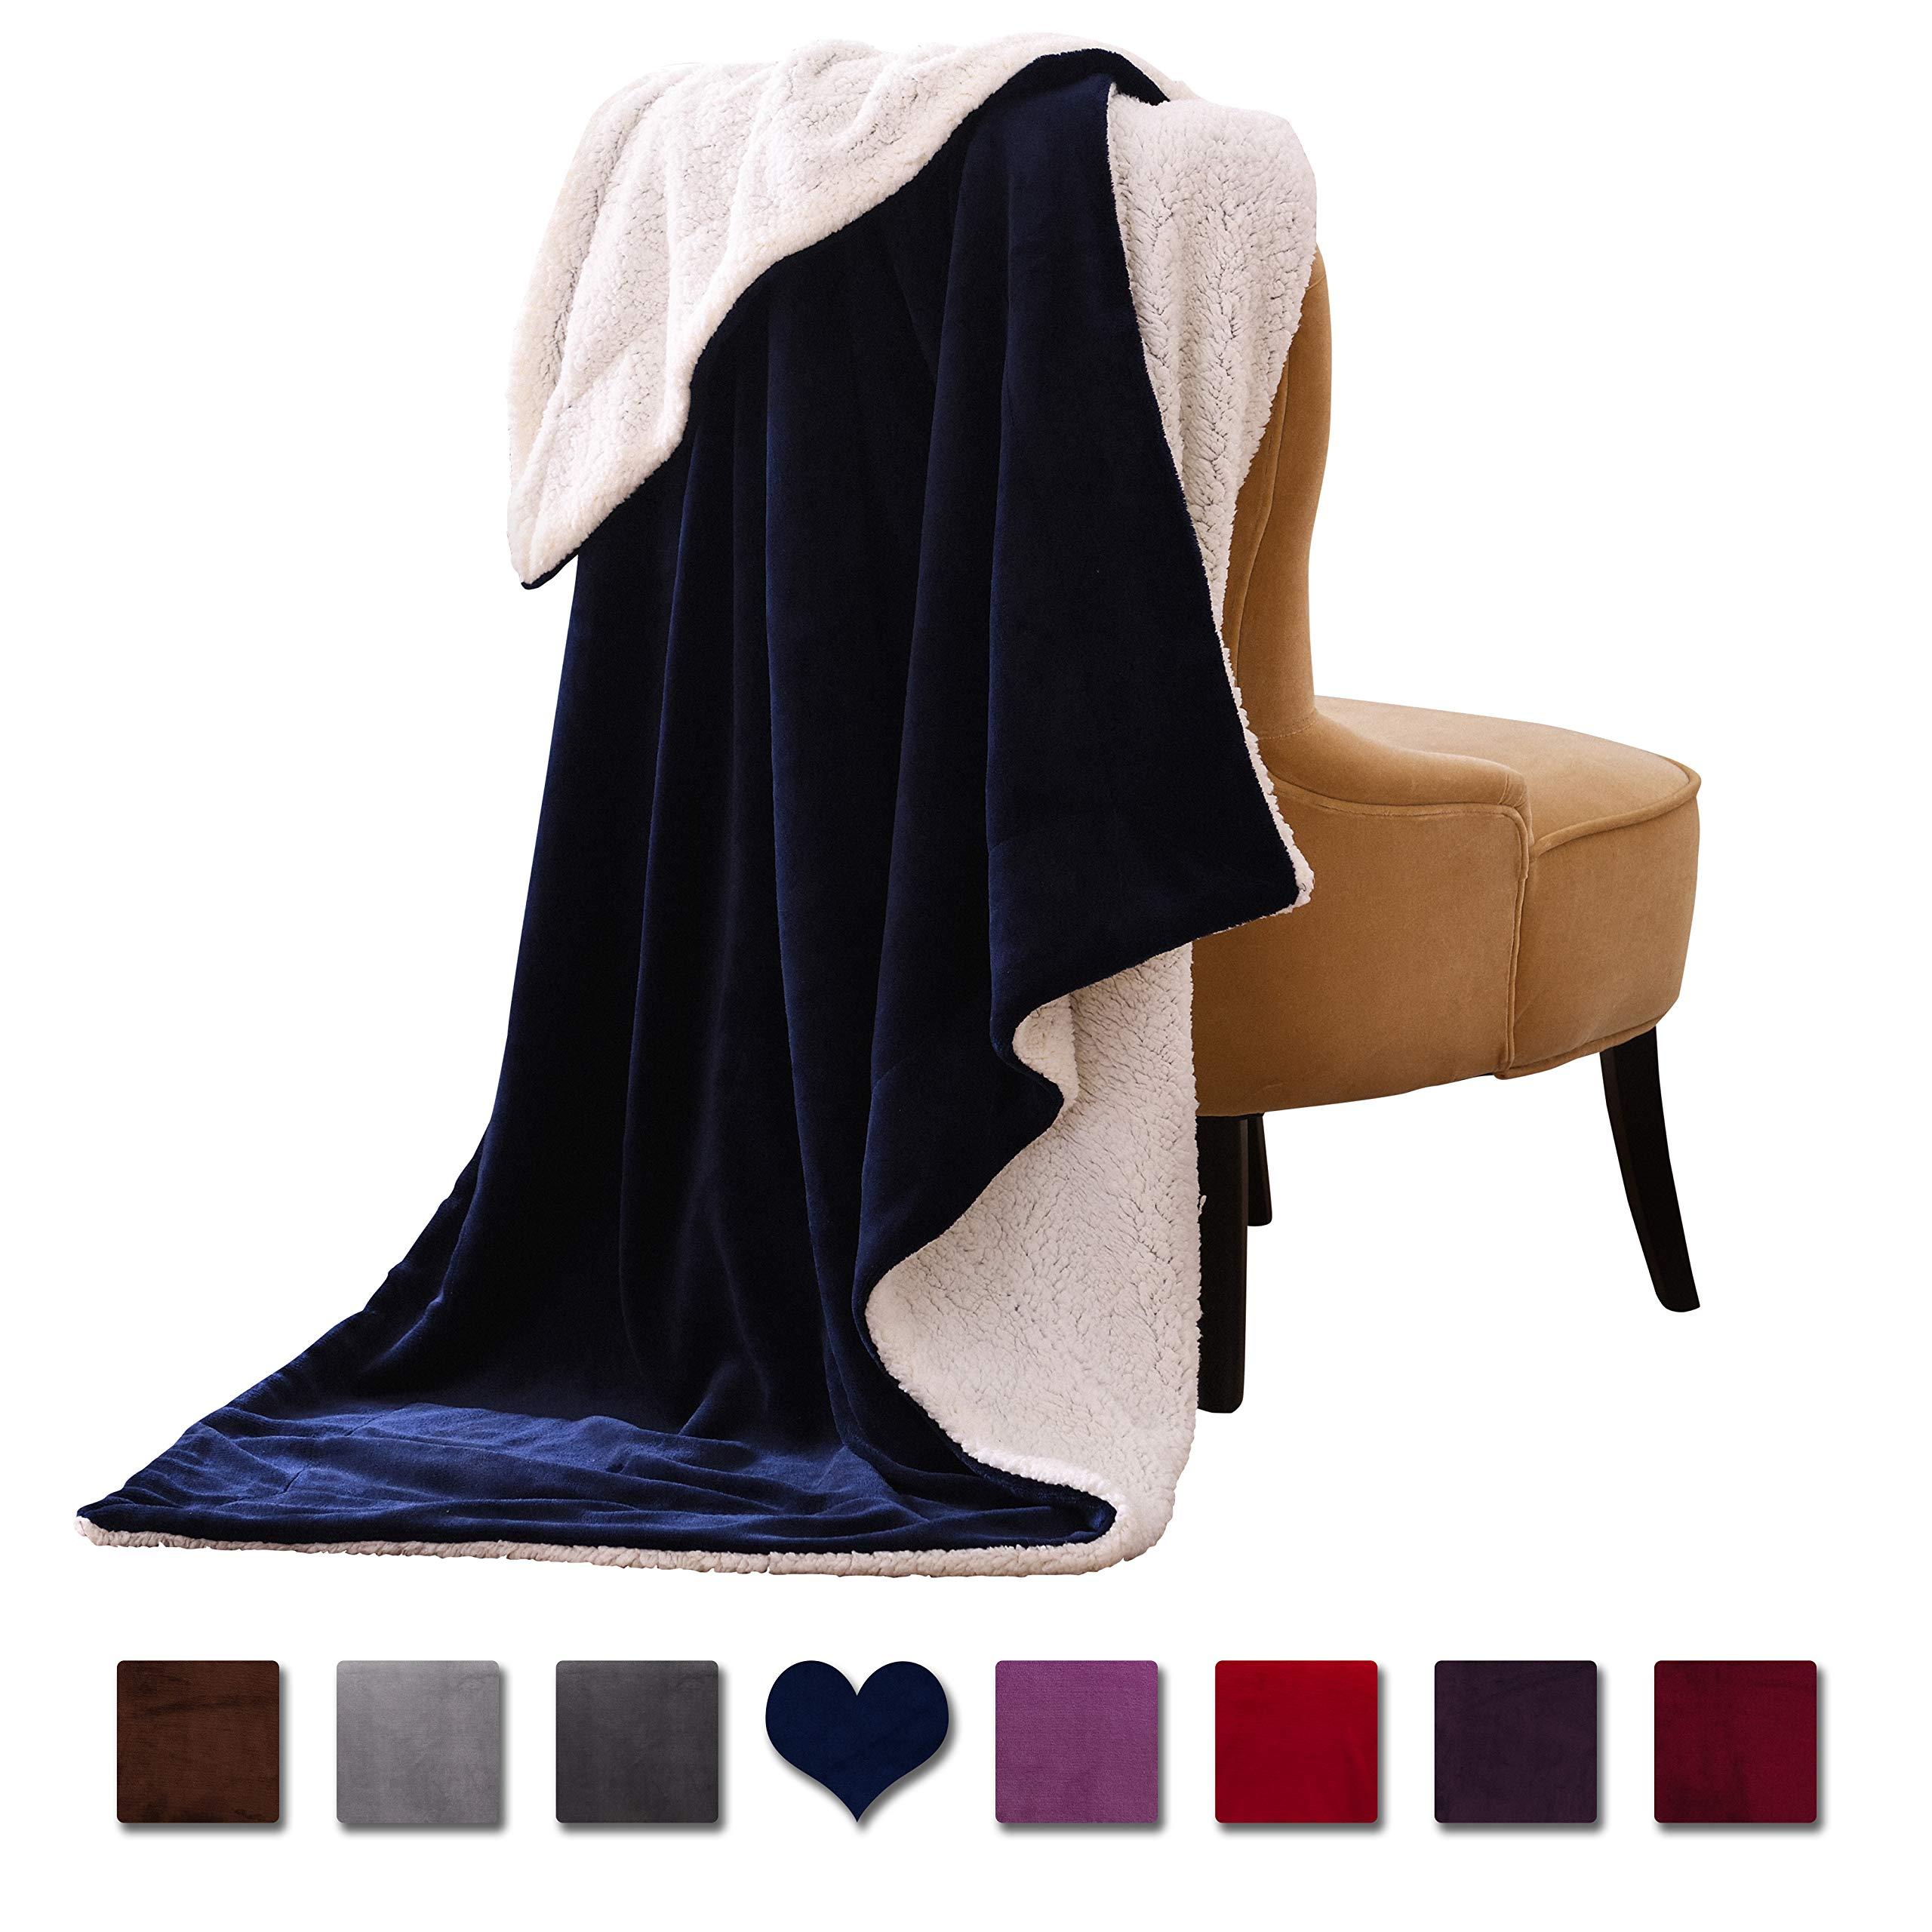 "VOTOWN HOME Sherpa Blanket Throw Cozy Soft Plush Blanket Reversible Warm Winter Blanket for Sofas Micro Fleece Fabric, Navy Blue Throw Size 50""x60"""